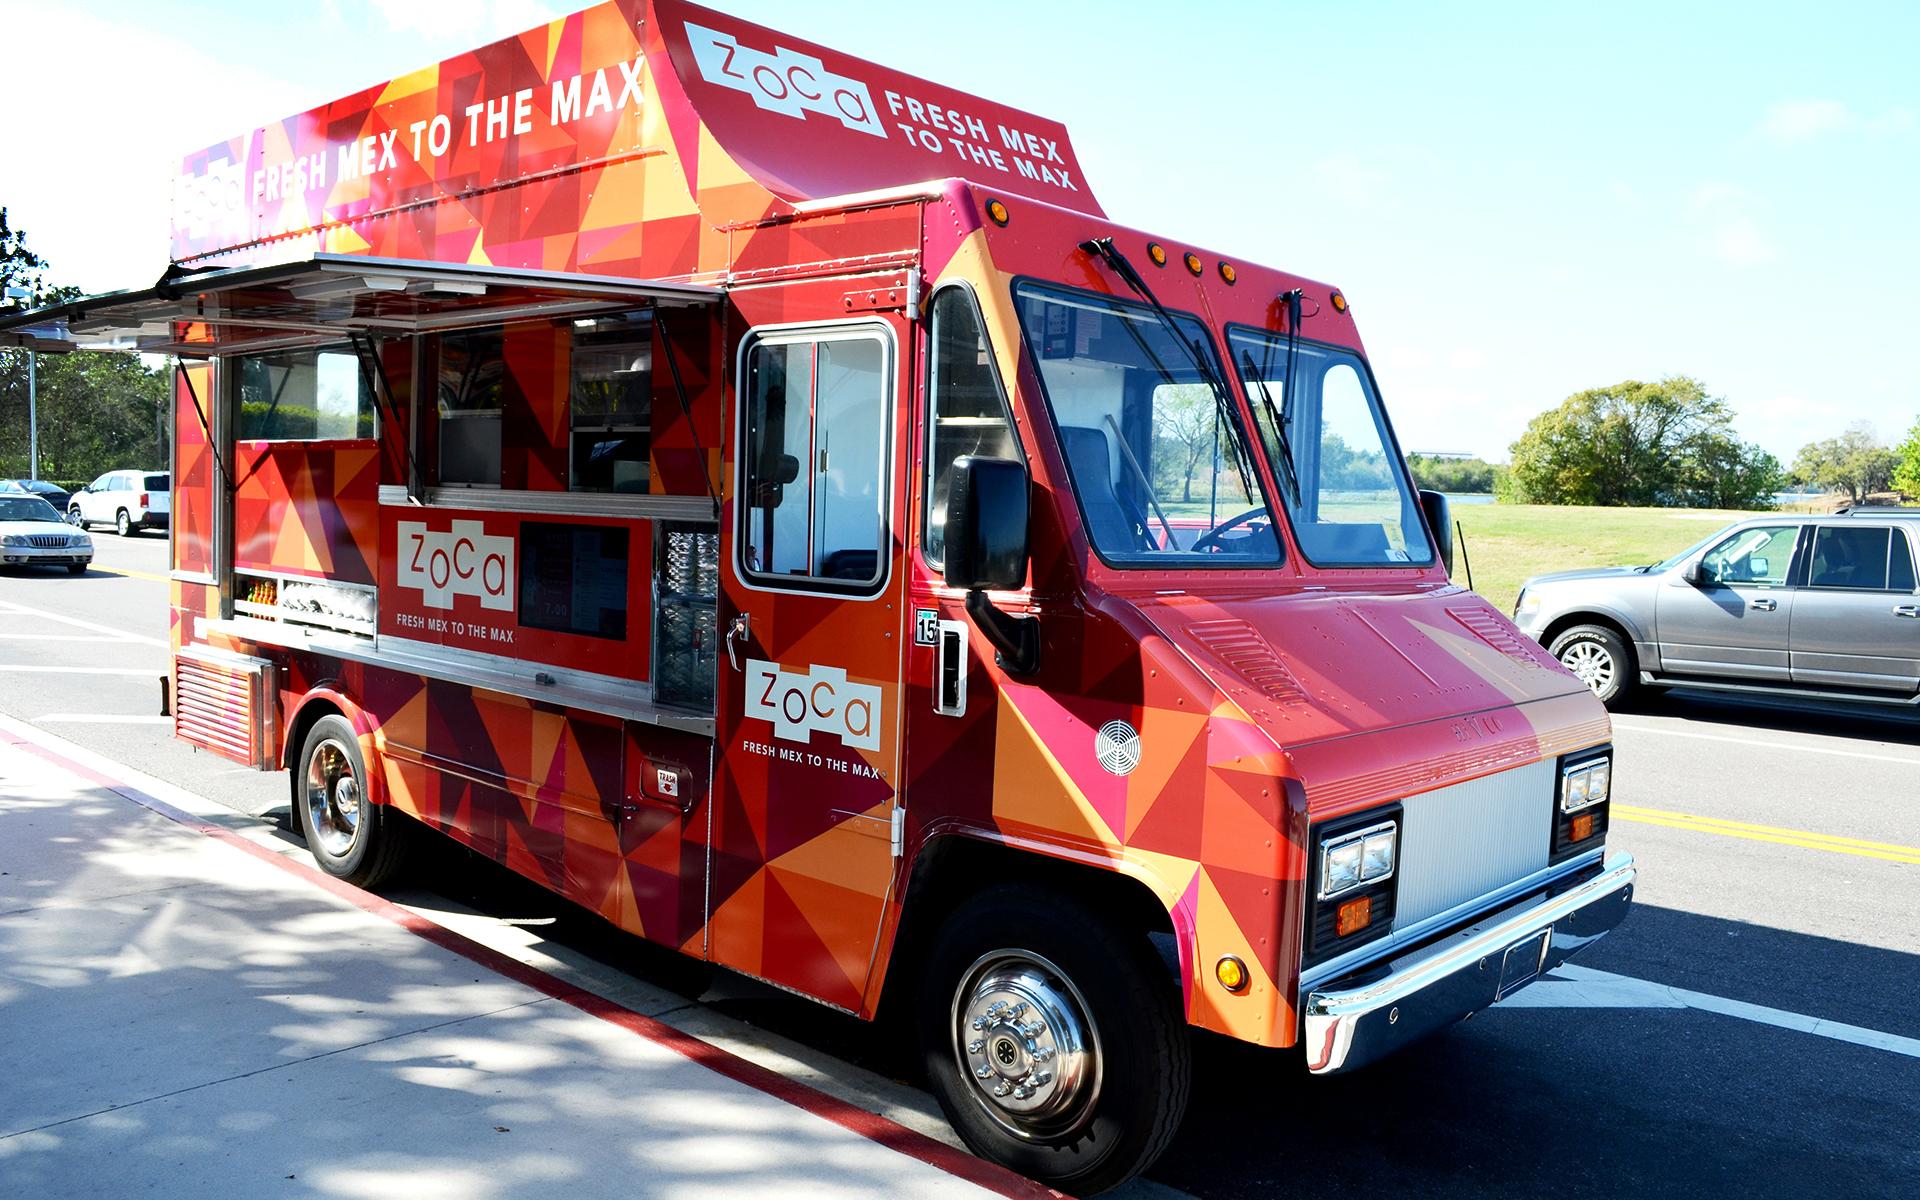 aramark, retail design, food service design phoenix, food truck graphic wrap, food truck branding, zoca, supergraphics, car design phoenix